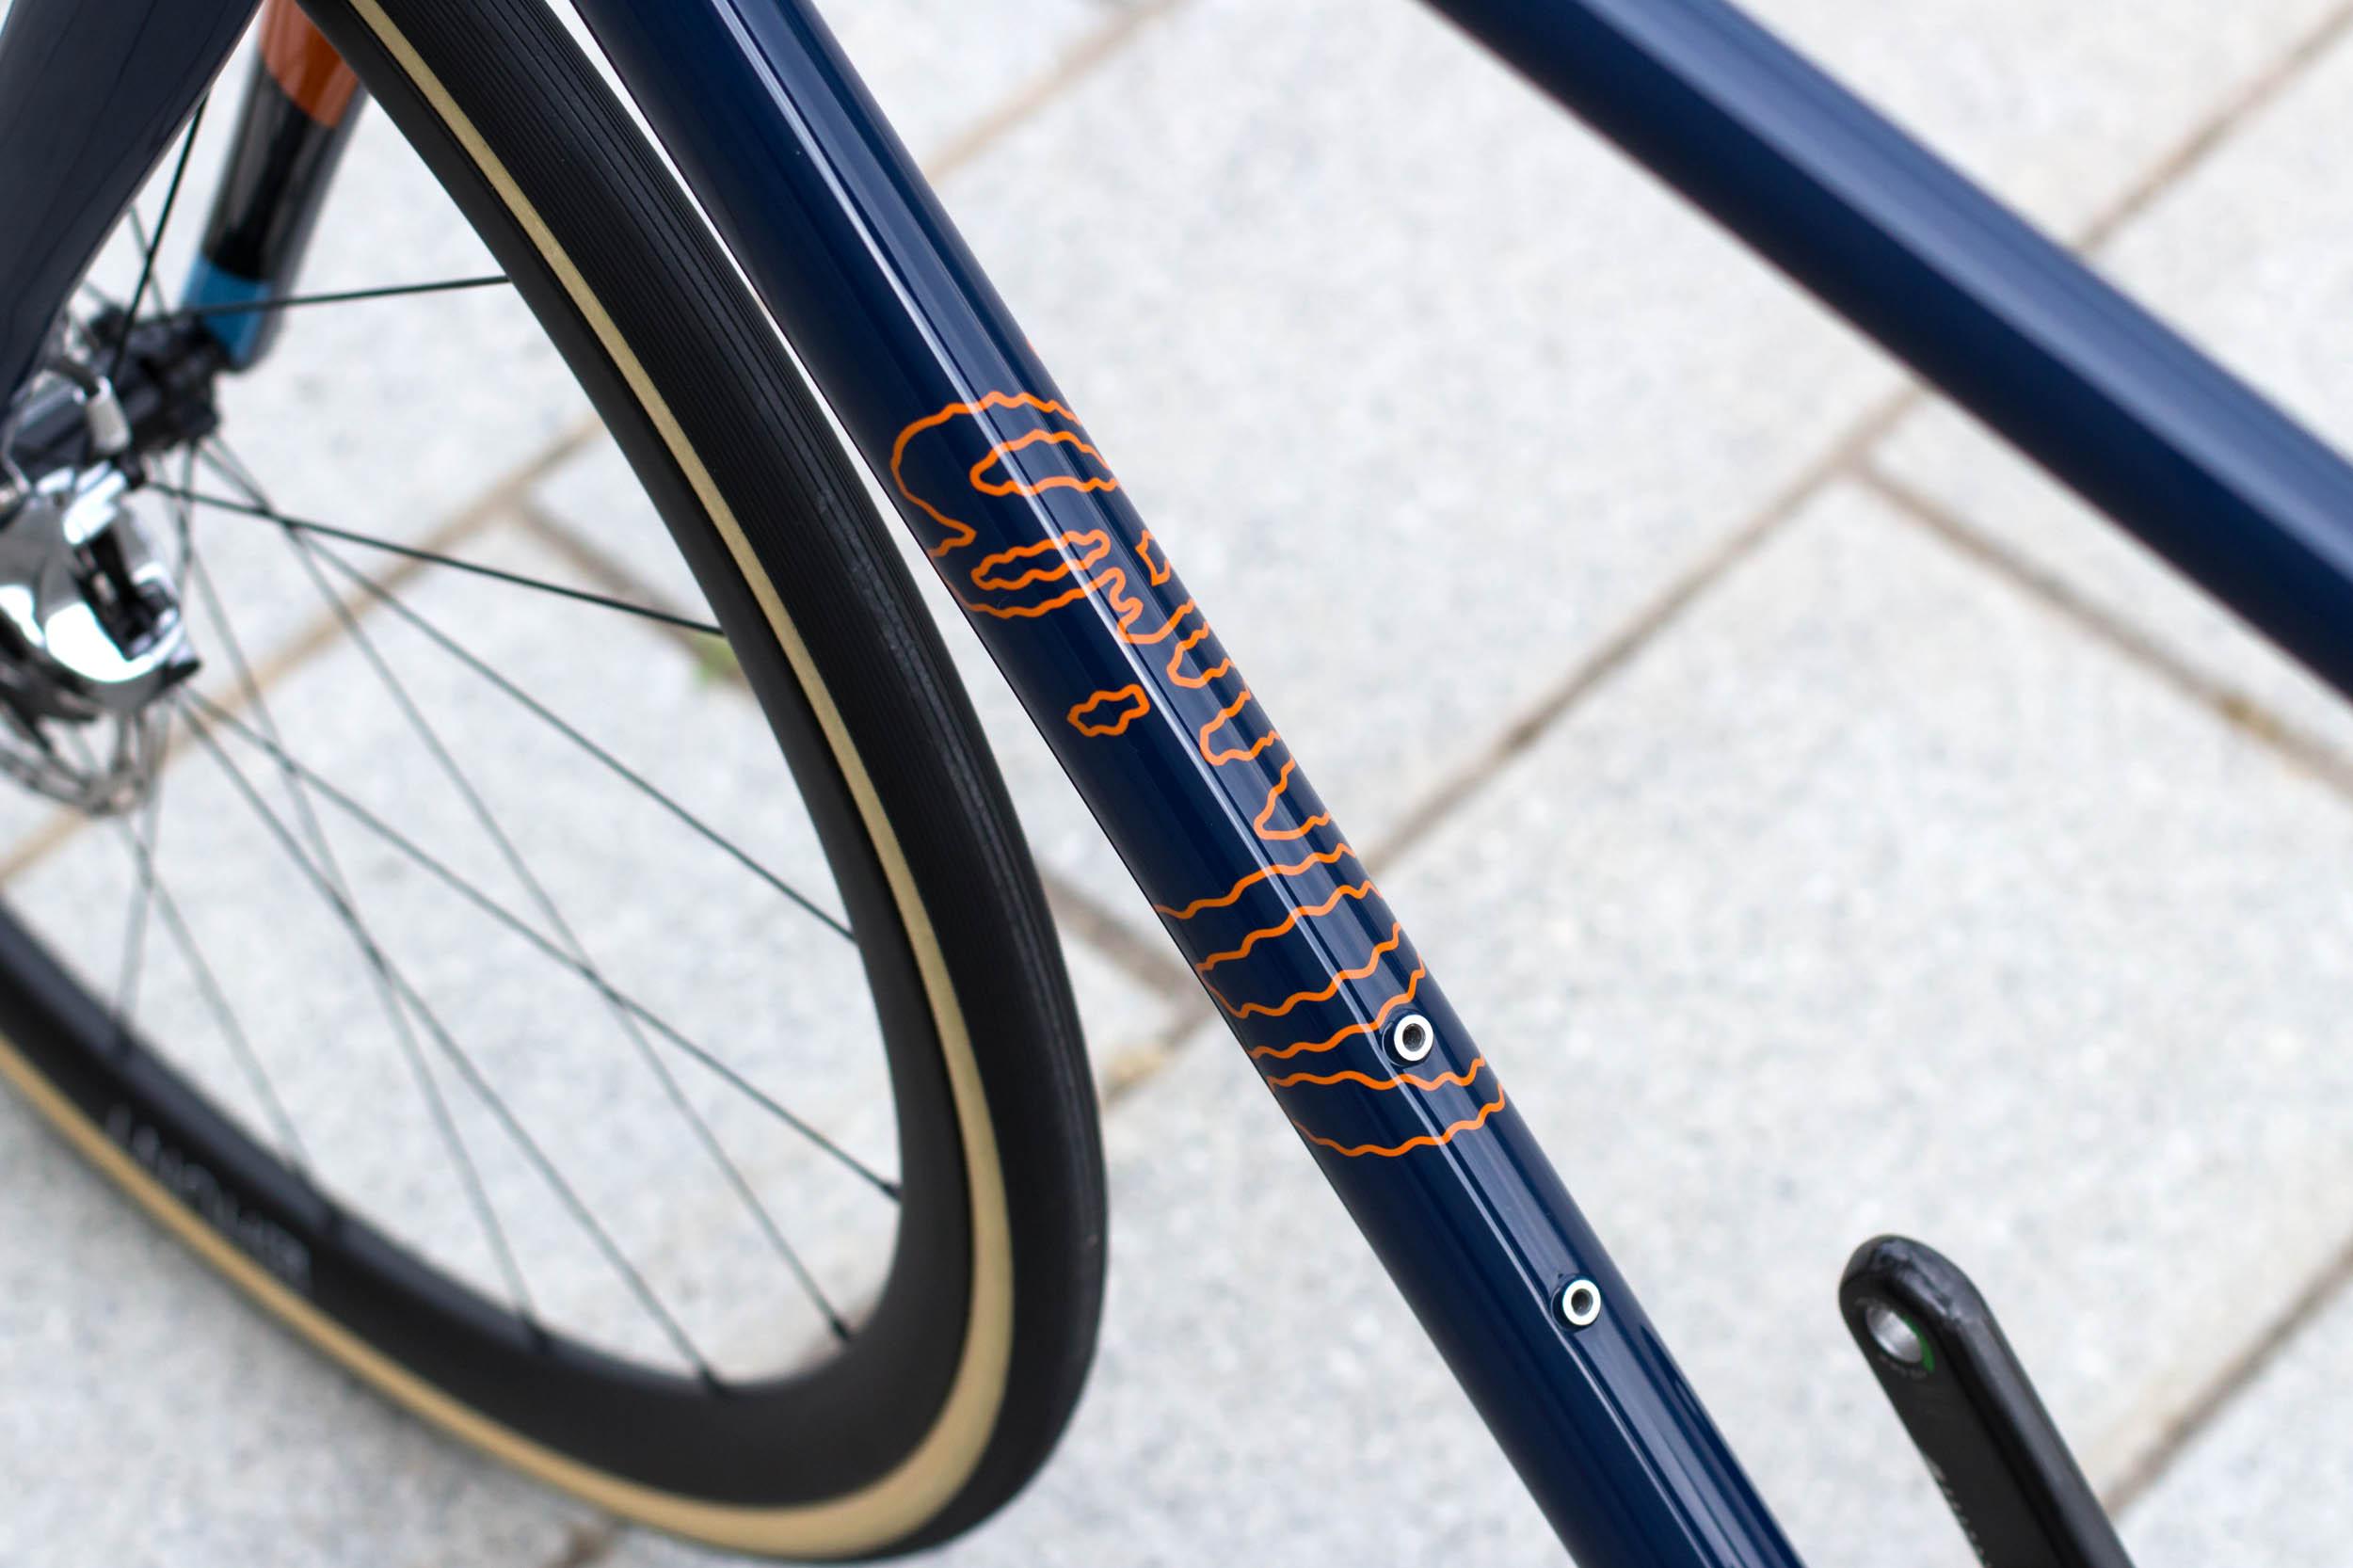 quirk_cycles_charlie_sheldon_durmitor_04.jpg